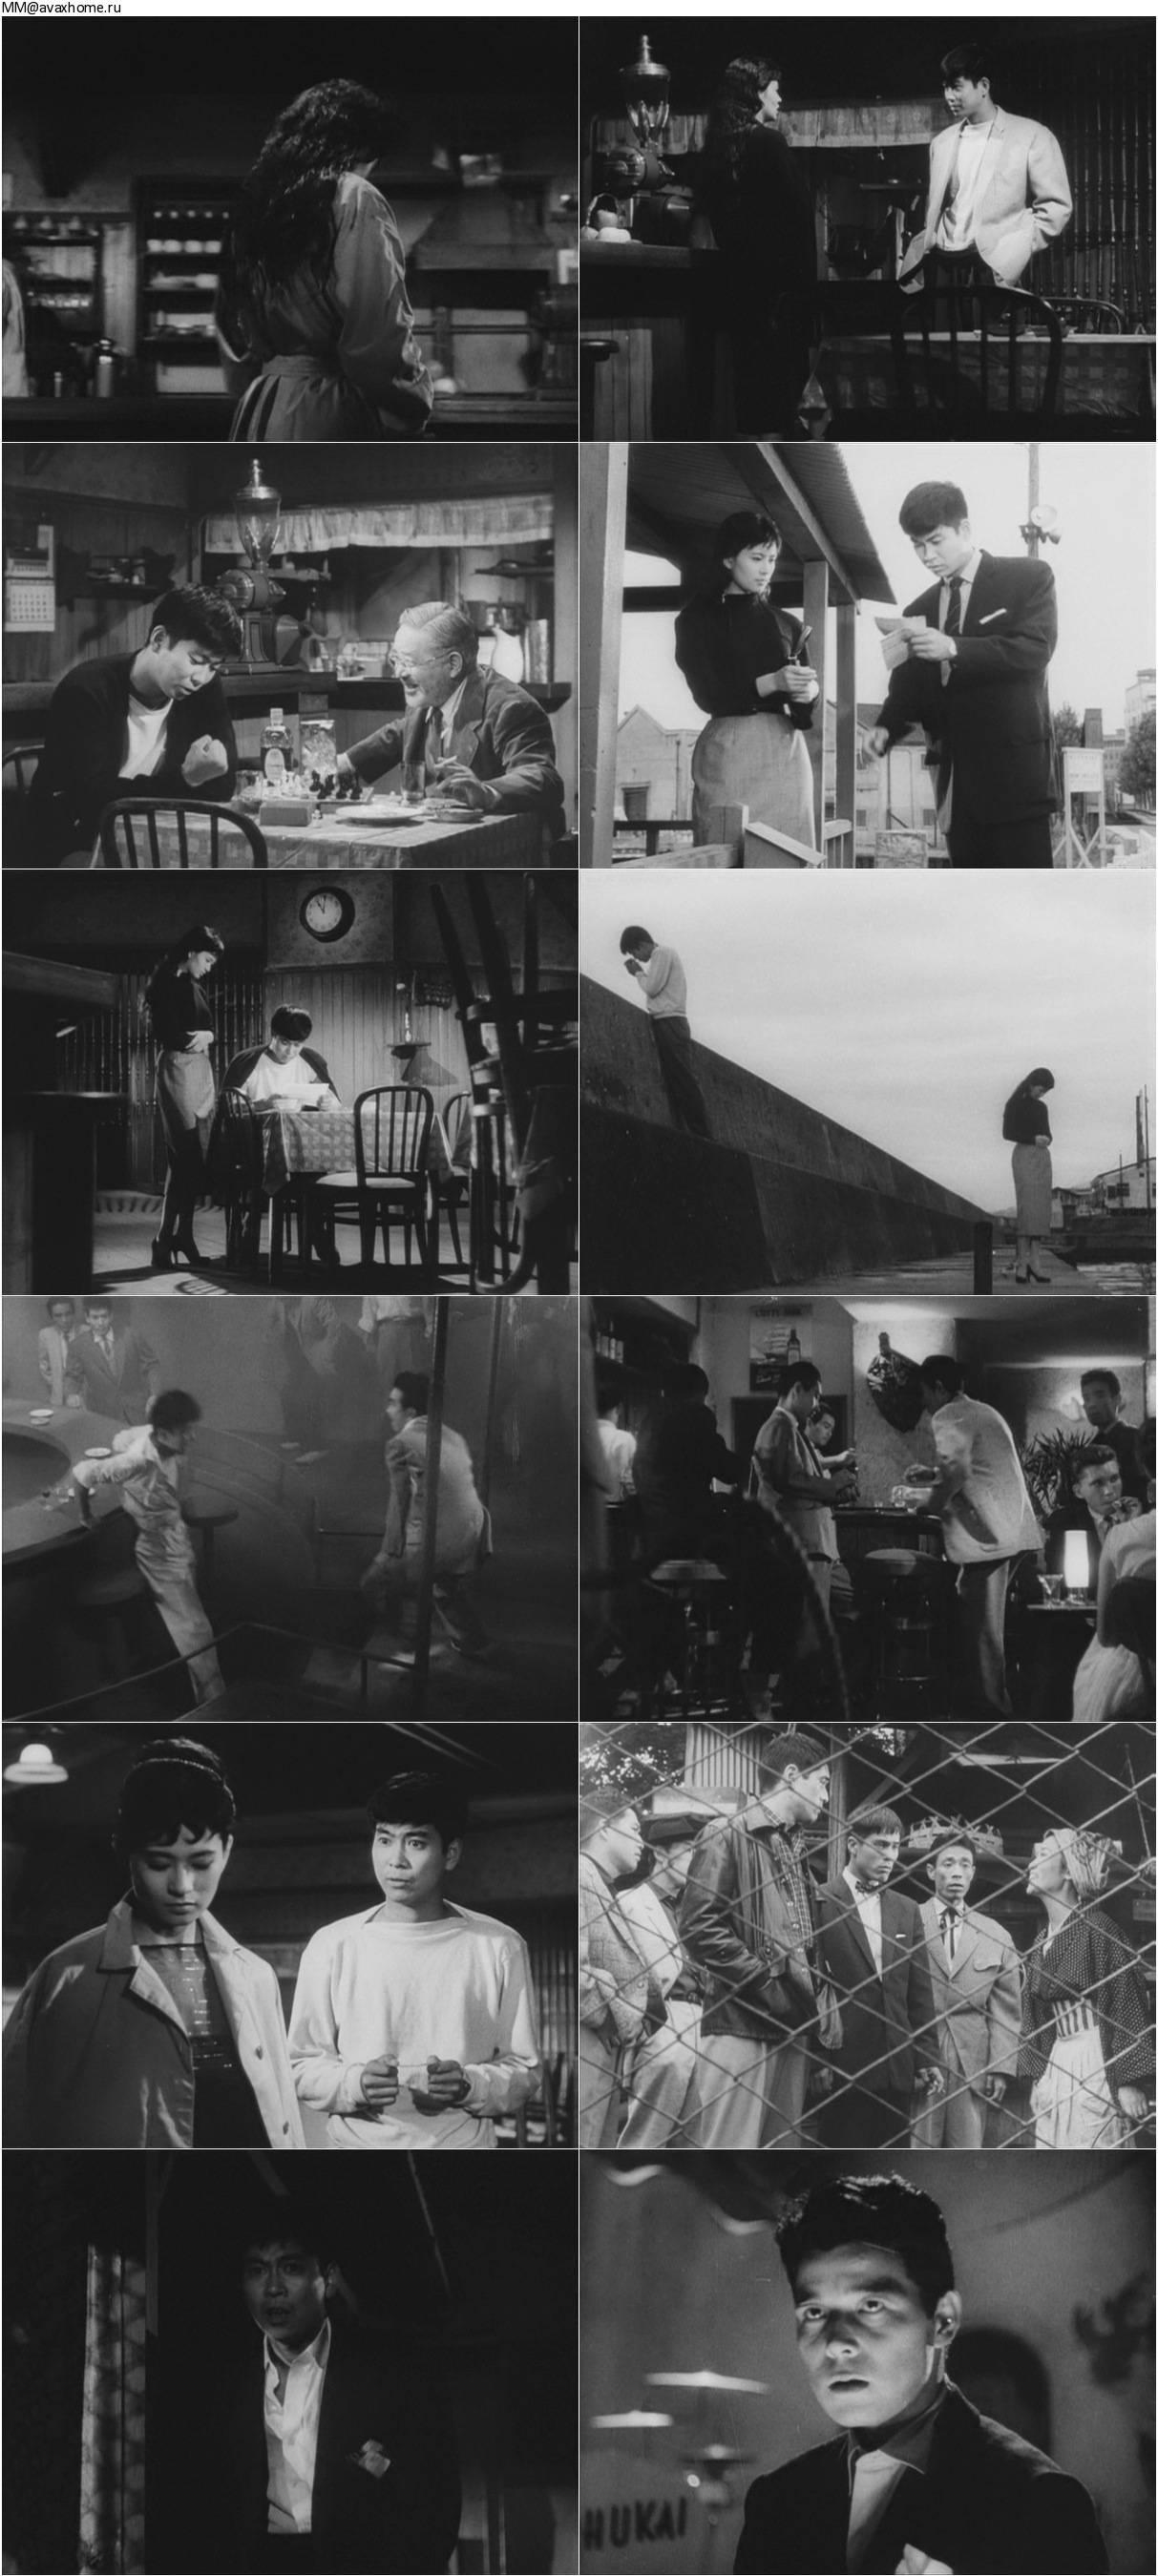 I Am Waiting (1957) Ore wa matteru ze [The Criterion Collection]